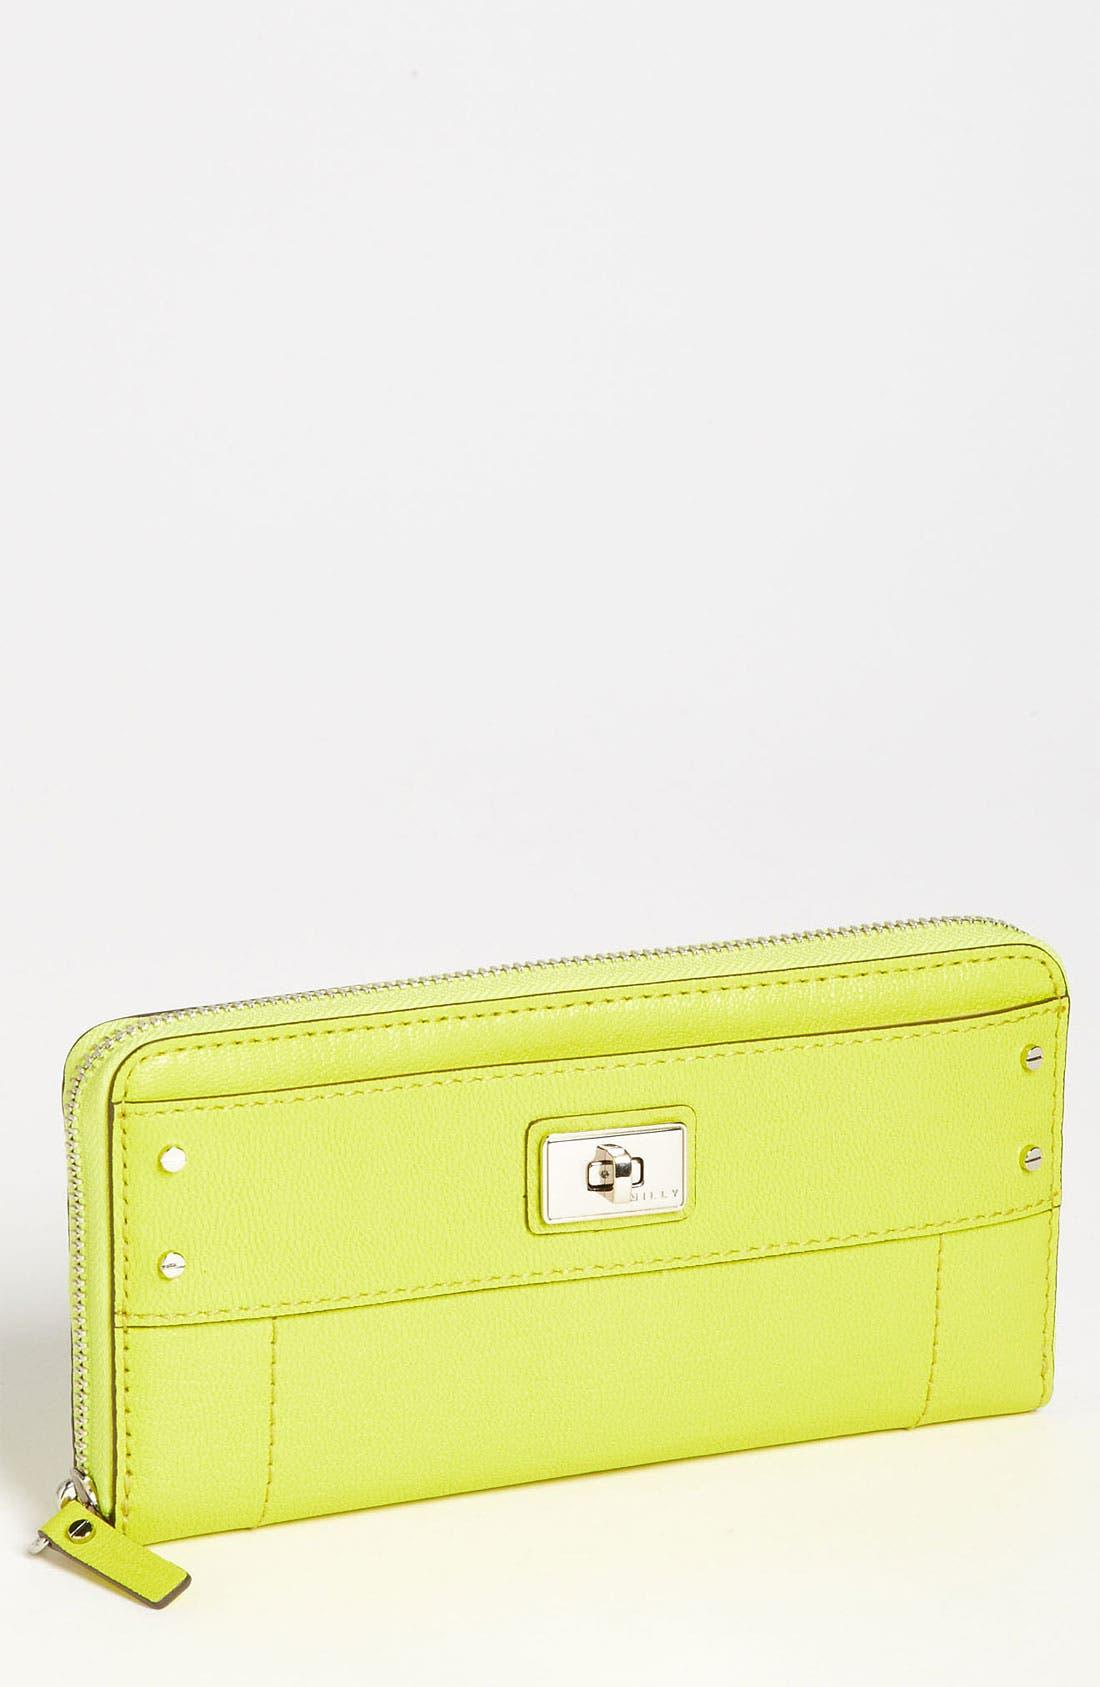 Alternate Image 1 Selected - Milly 'Kiera' Wallet